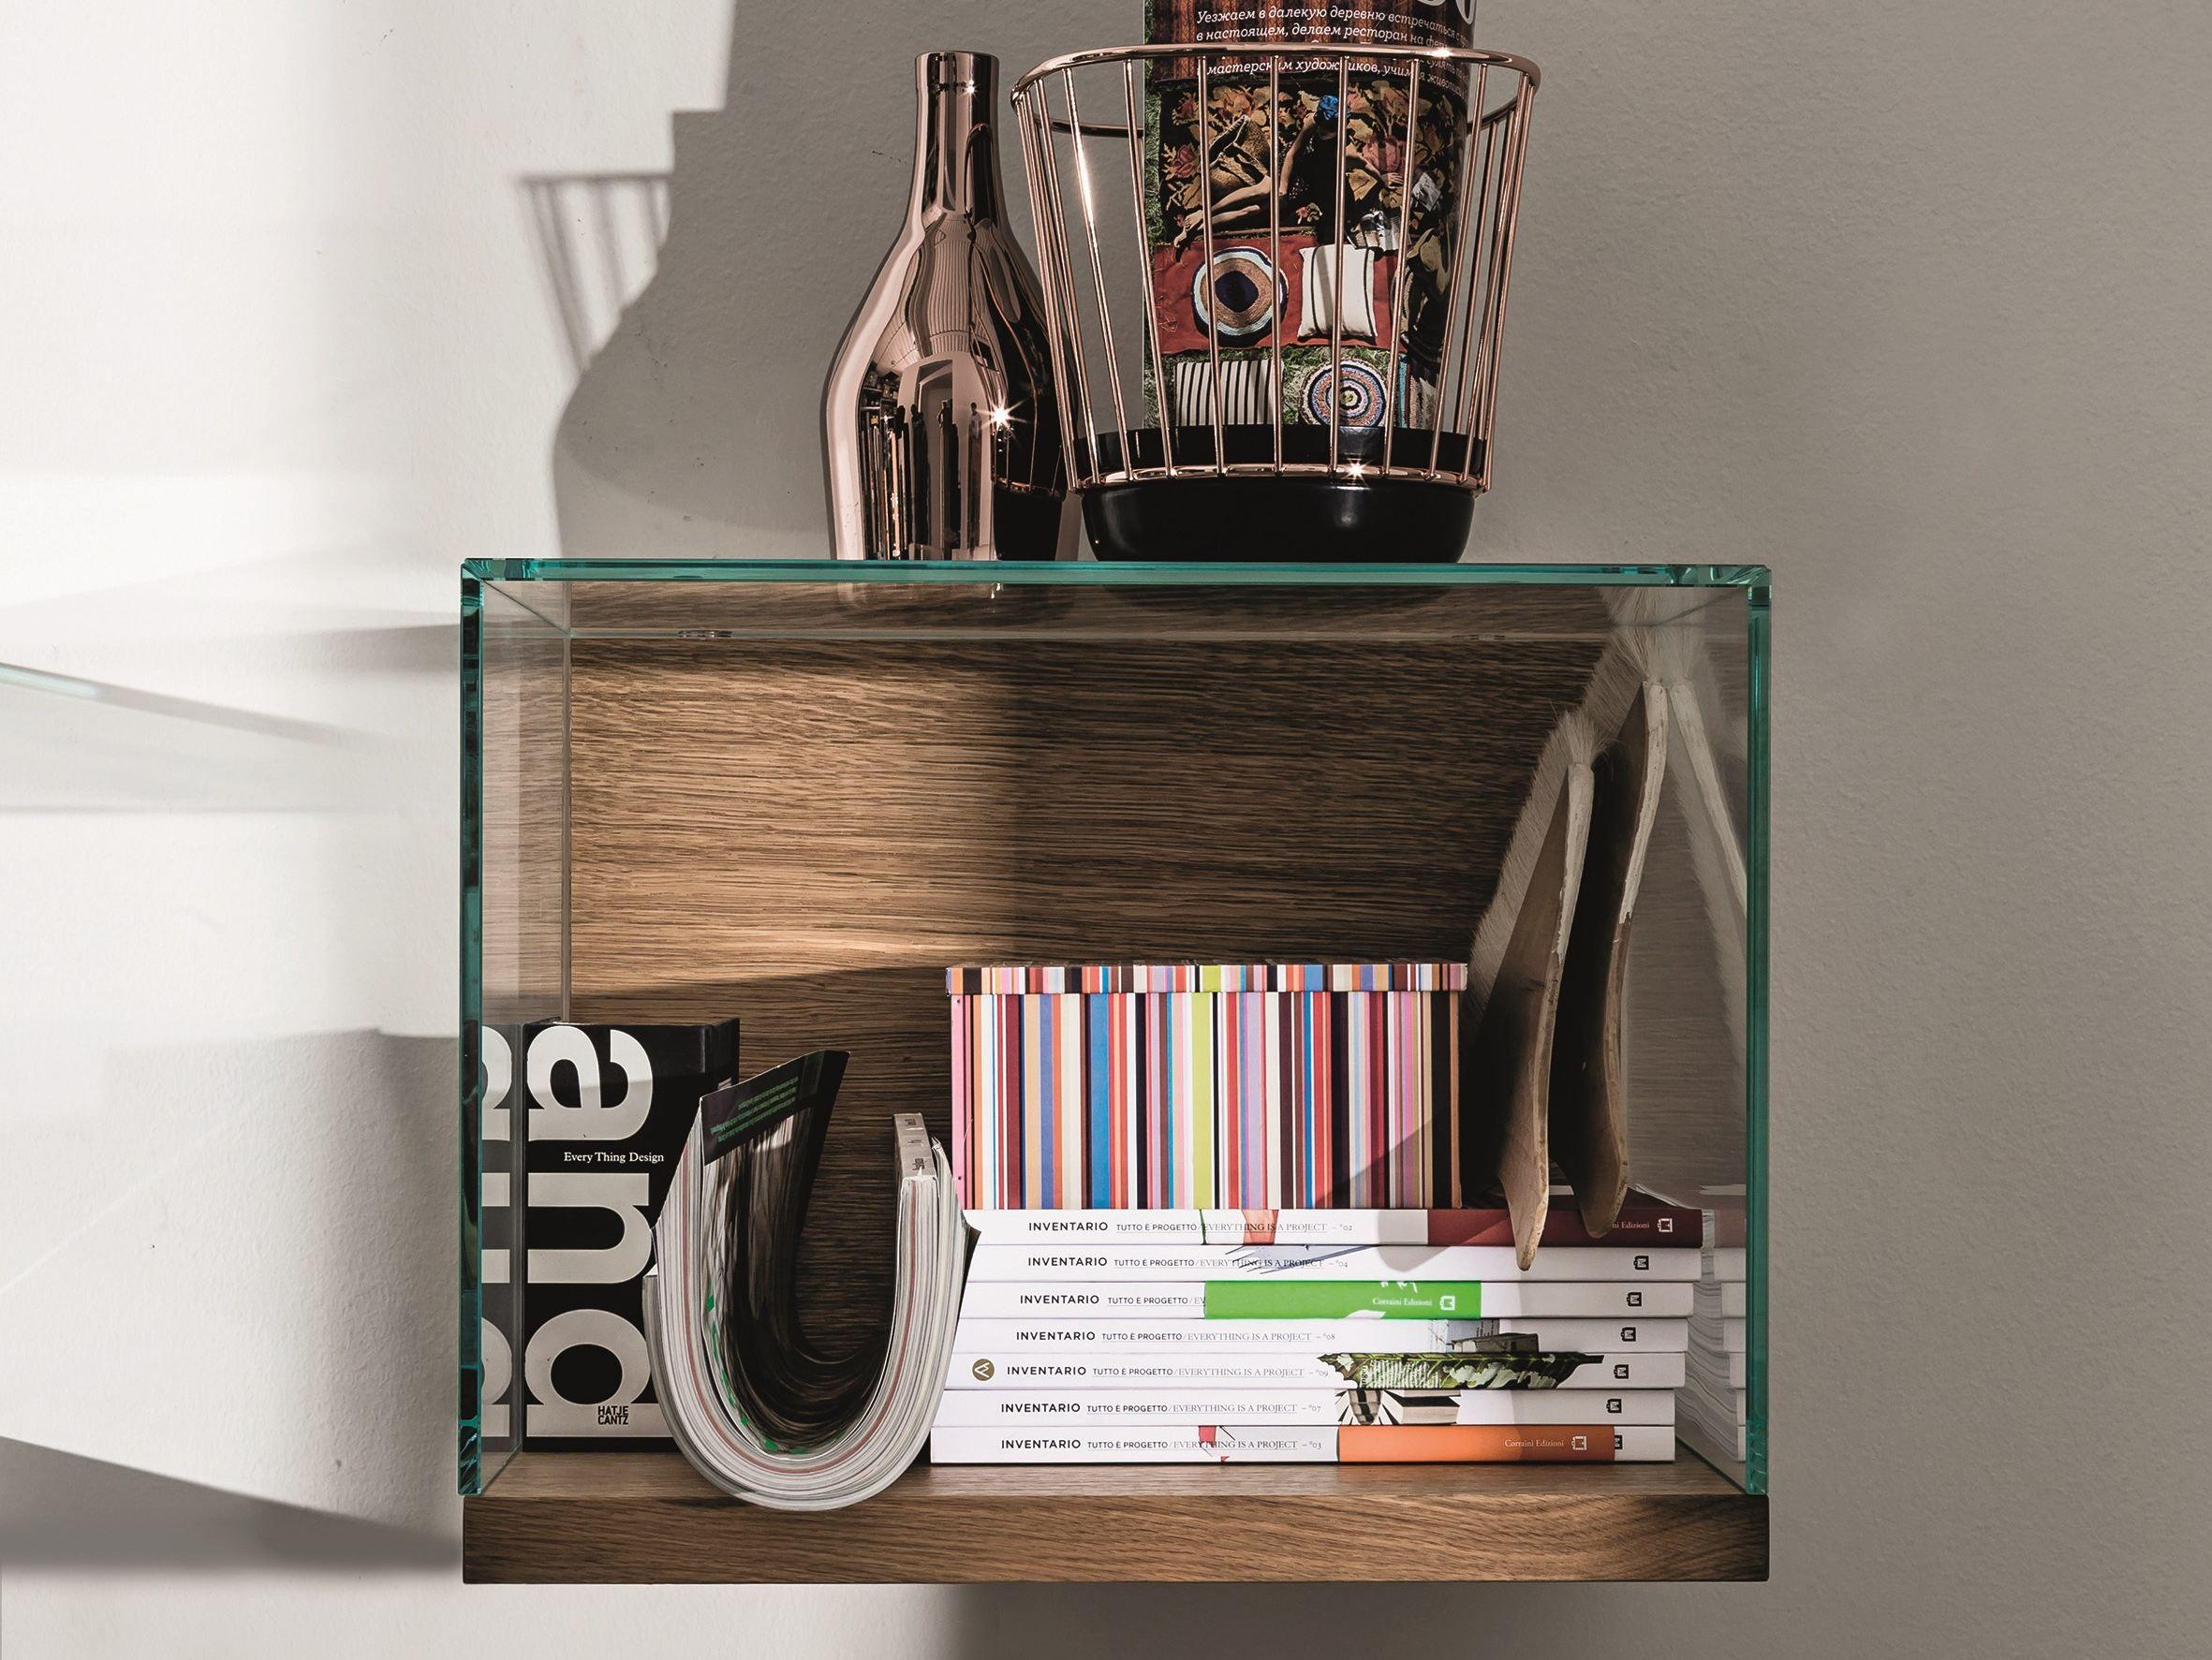 Vetrine negozi in legno: vm arredamenti cuneo vetrine interne ed ...